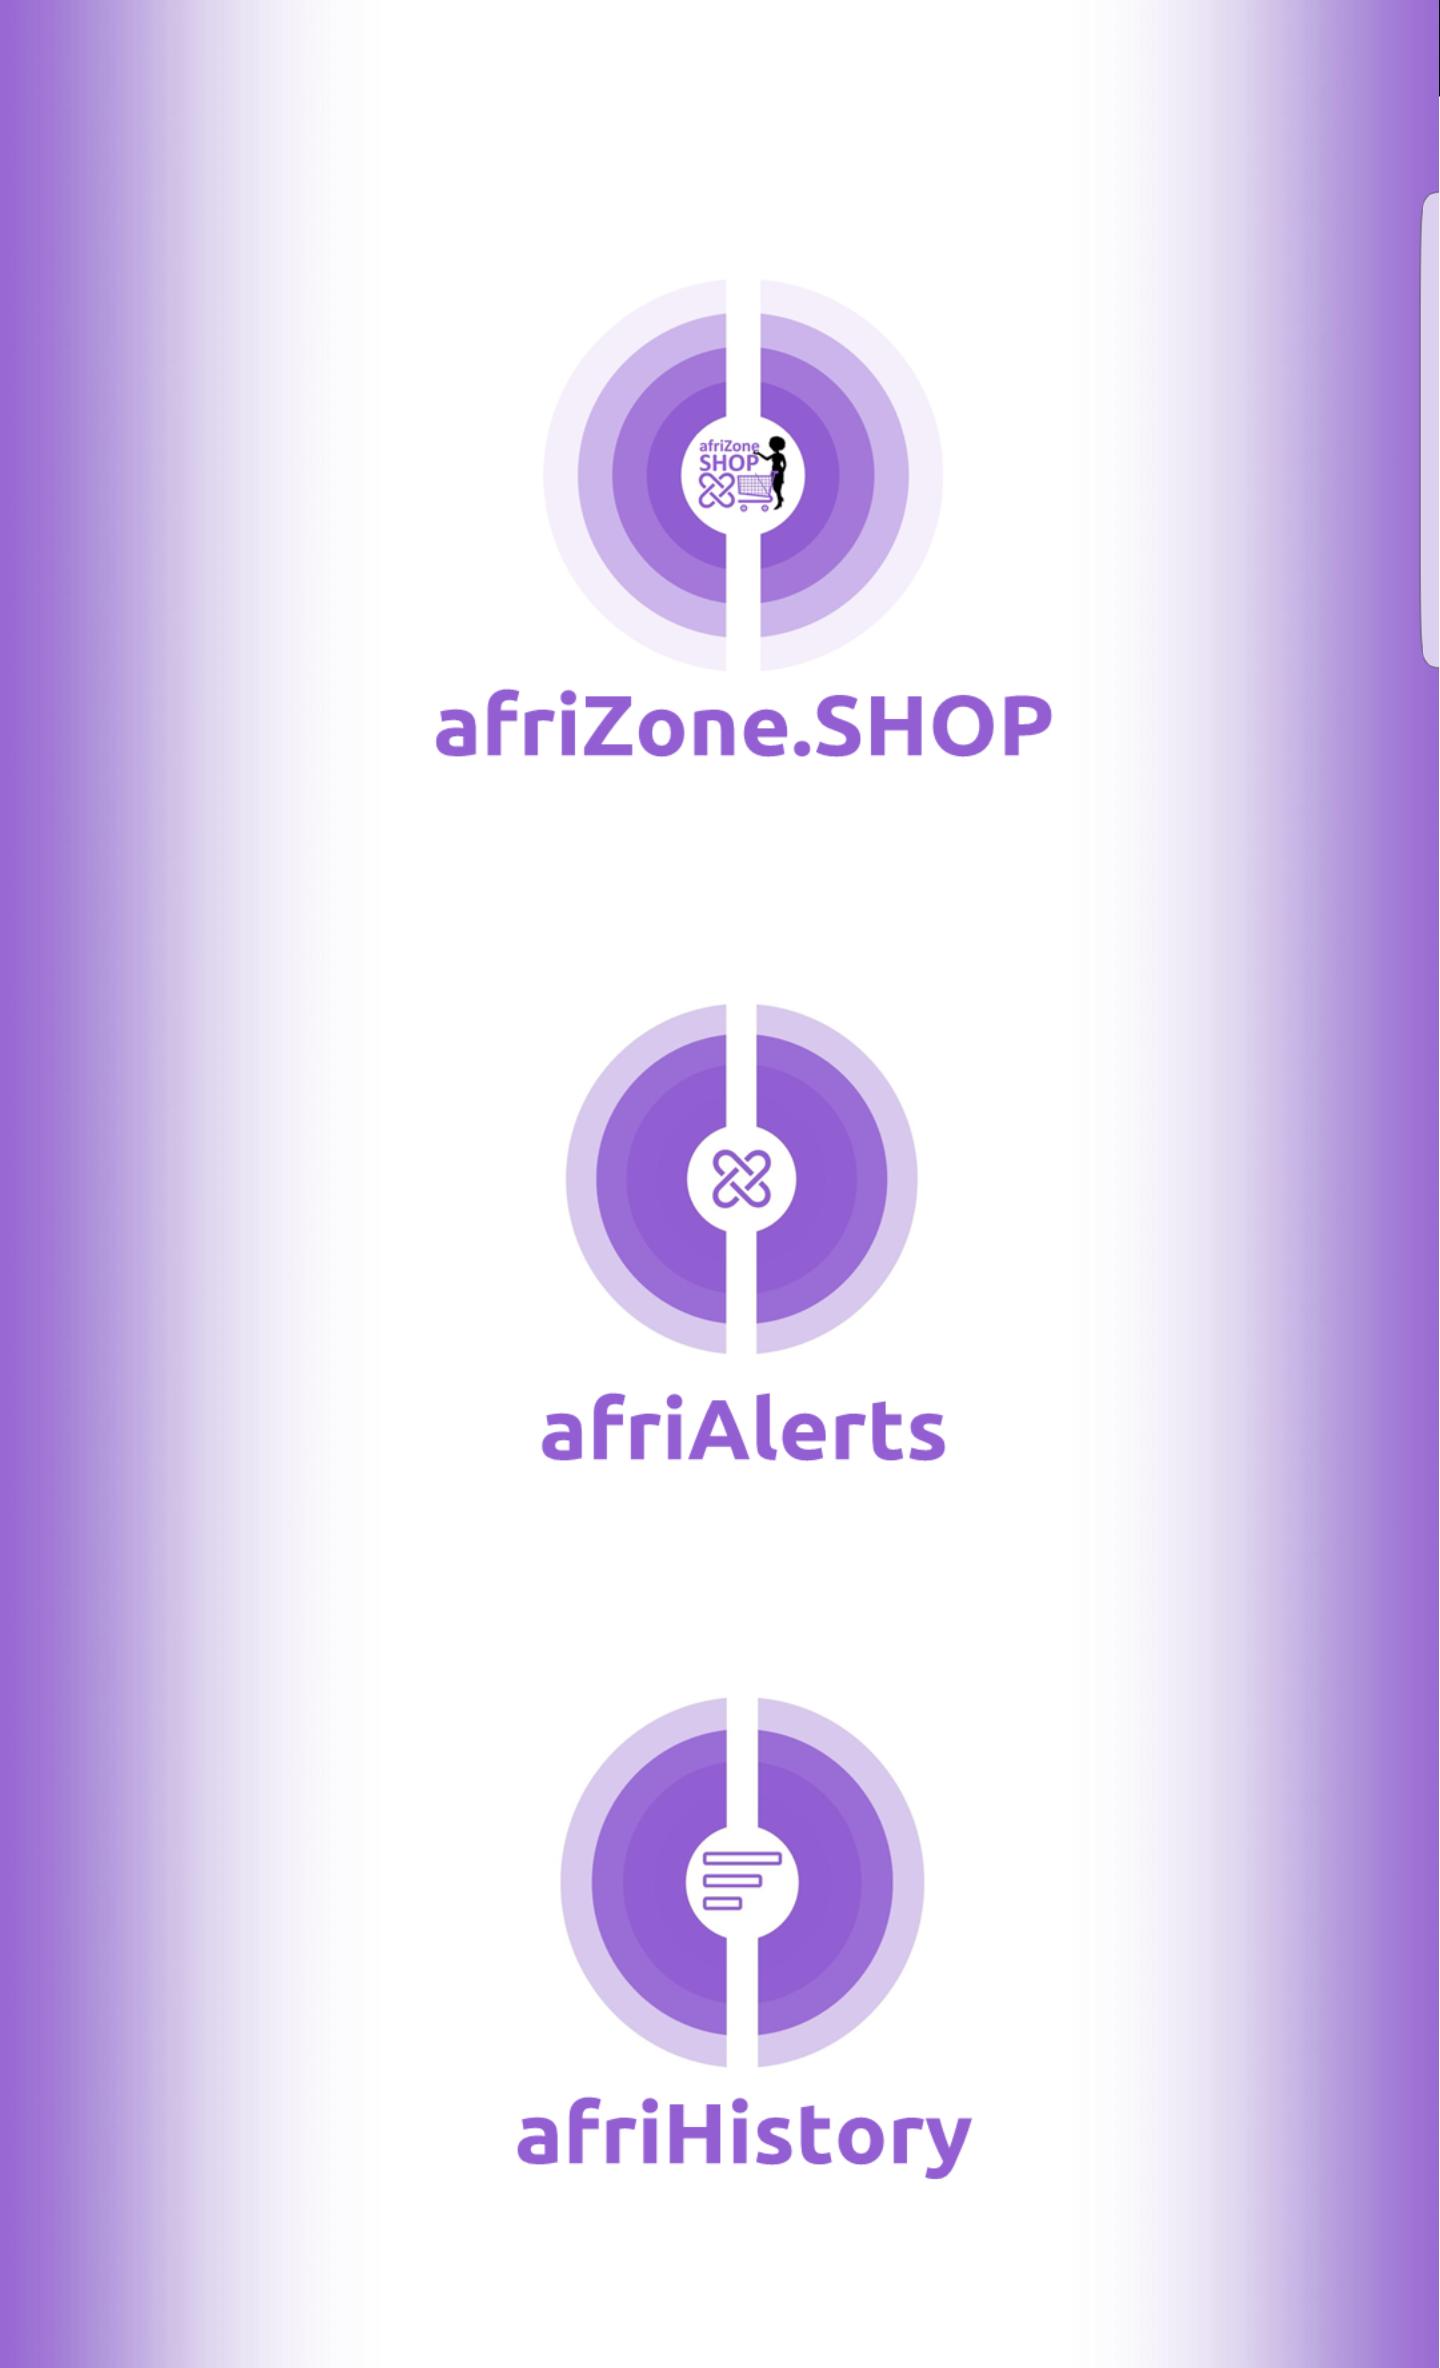 UmojApp Menu_afriZone.SHOP